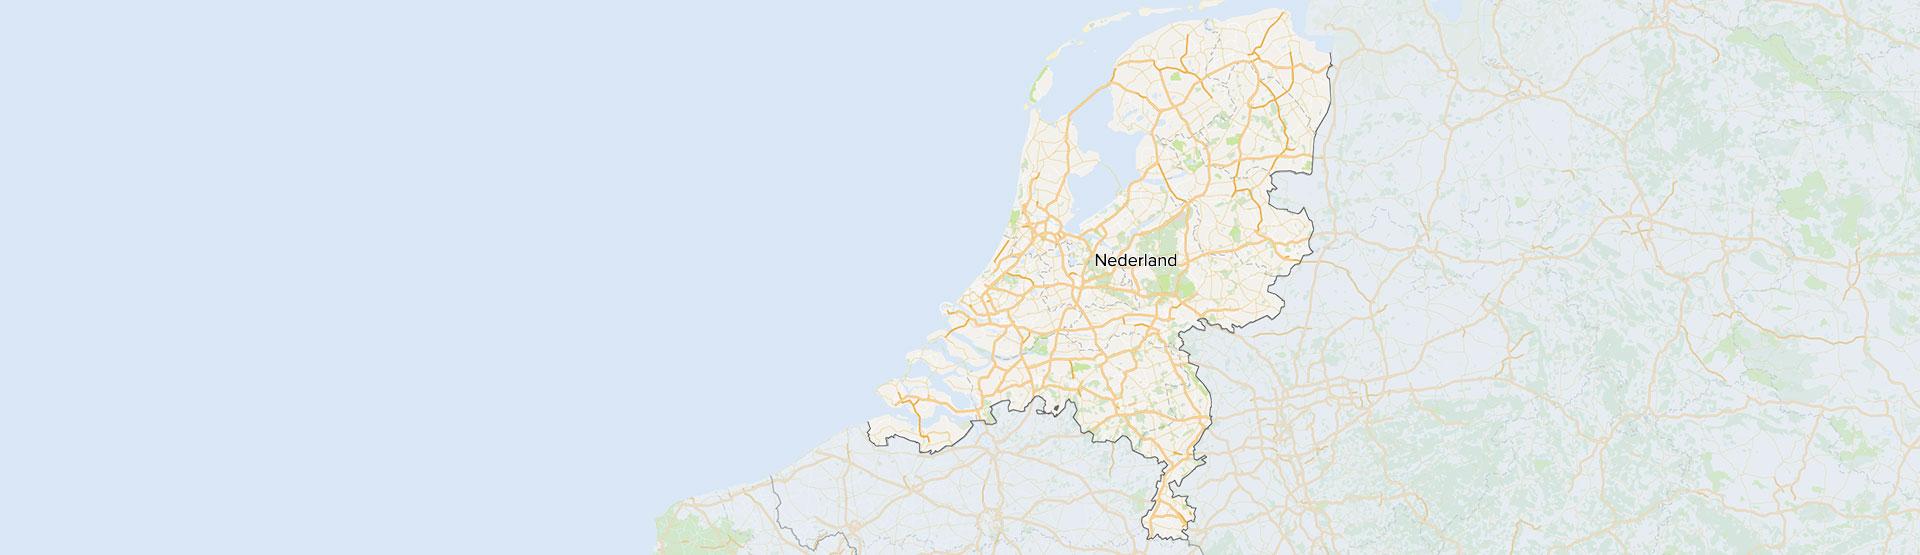 van-boxtel-map-1920x555